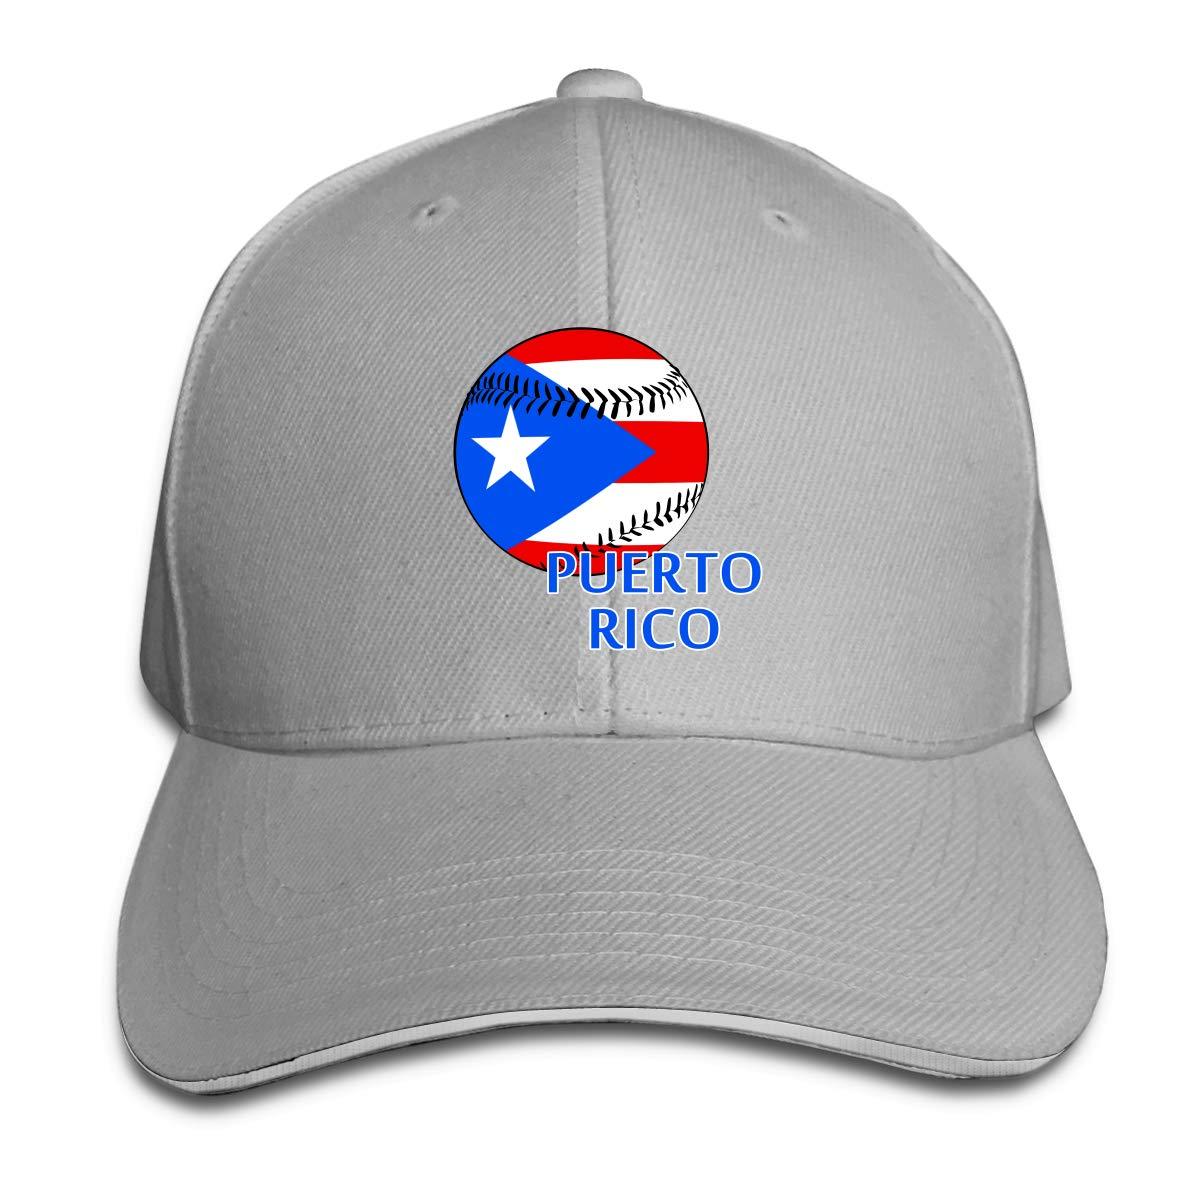 WFIRE Adult Baseball Caps Puerto Rico Baseball Custom Adjustable Sandwich Cap Casquette Hats